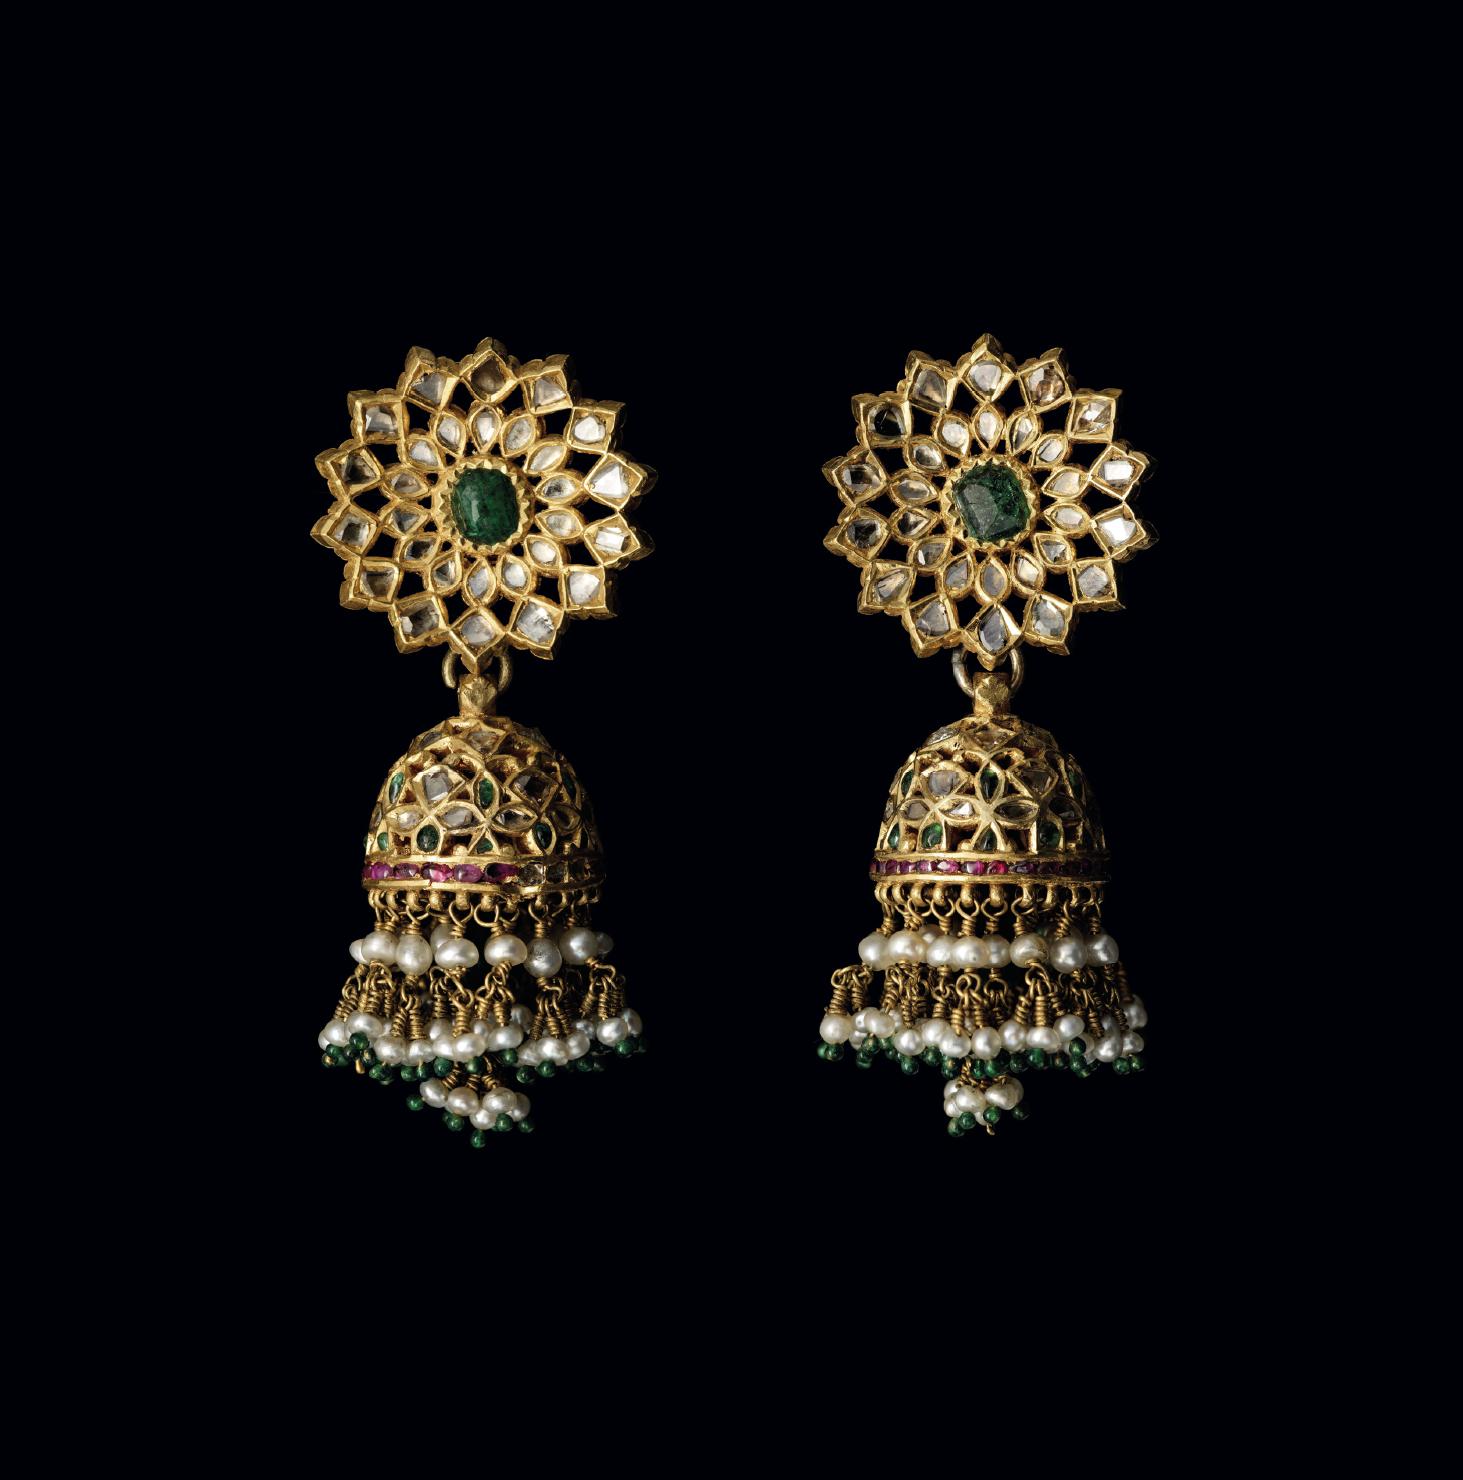 A PAIR OF MAHARANI JIND KAUR'S EARRINGS